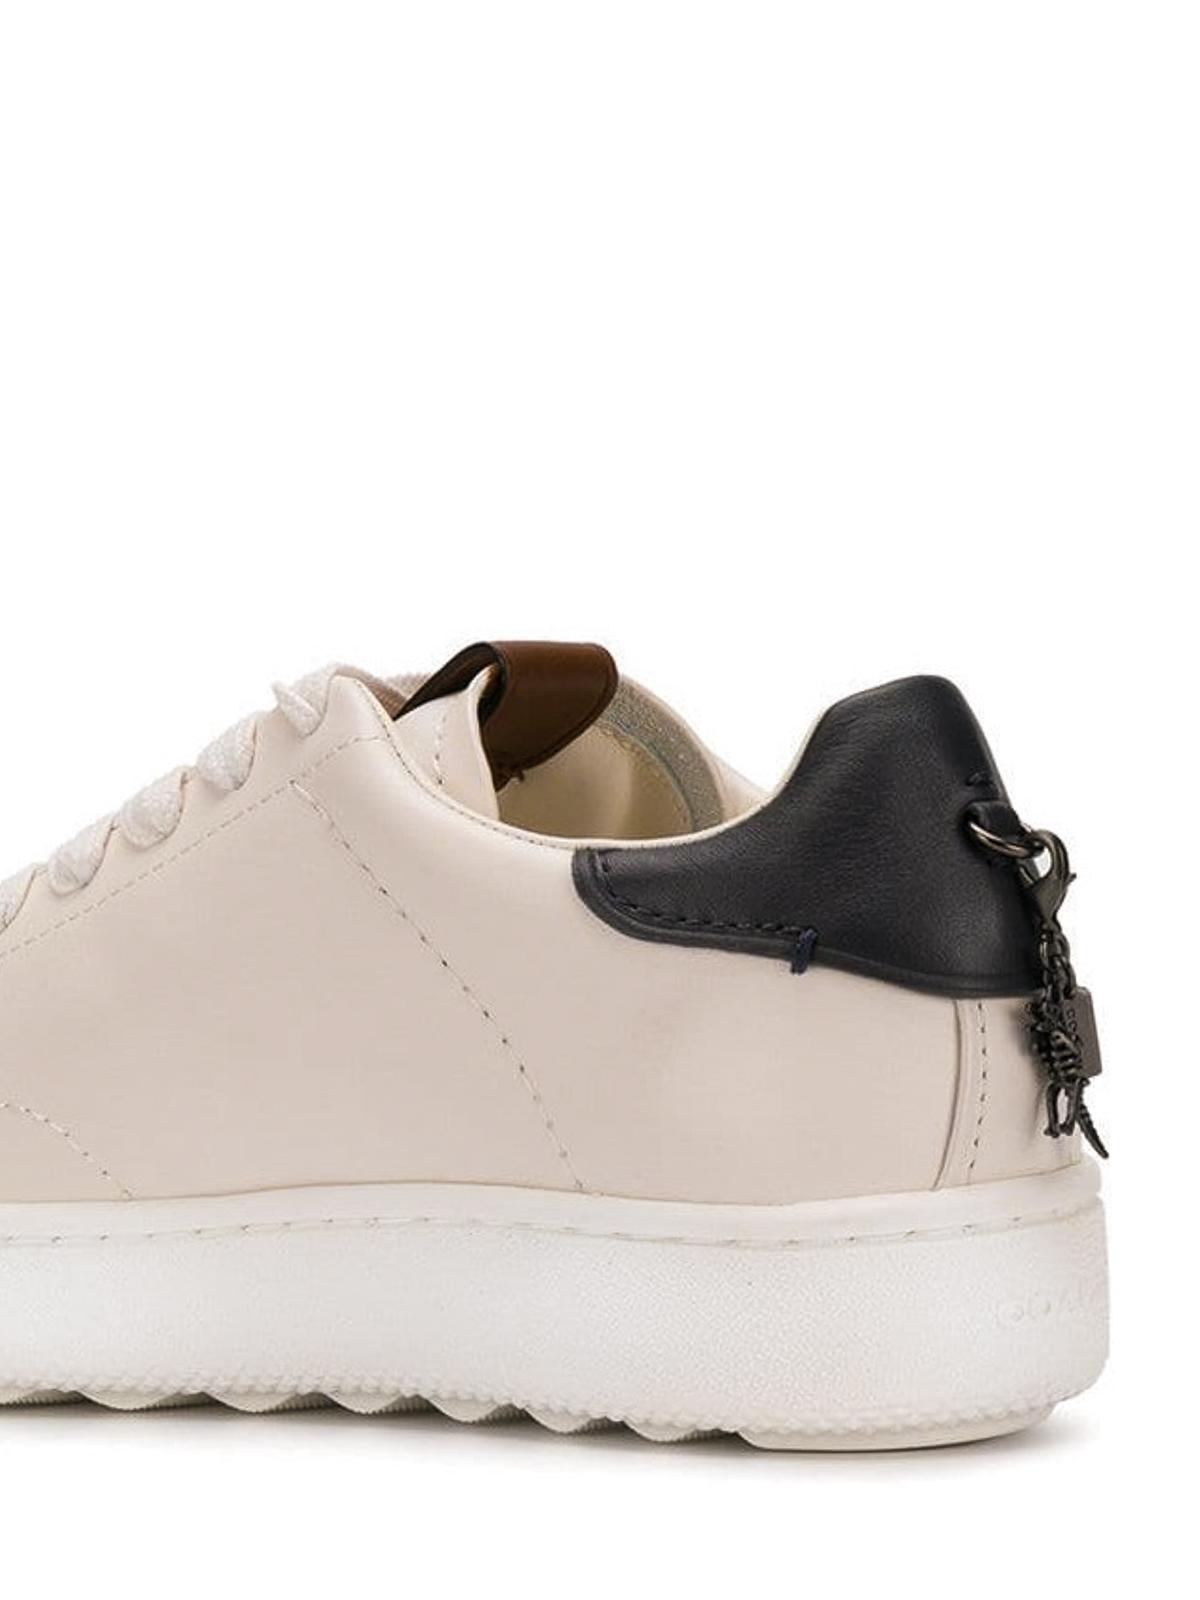 0a87cea0c18d49 Coach - Baskets - C101 - Chaussures de sport - G1903WHITEMIDNIGHTNAVY